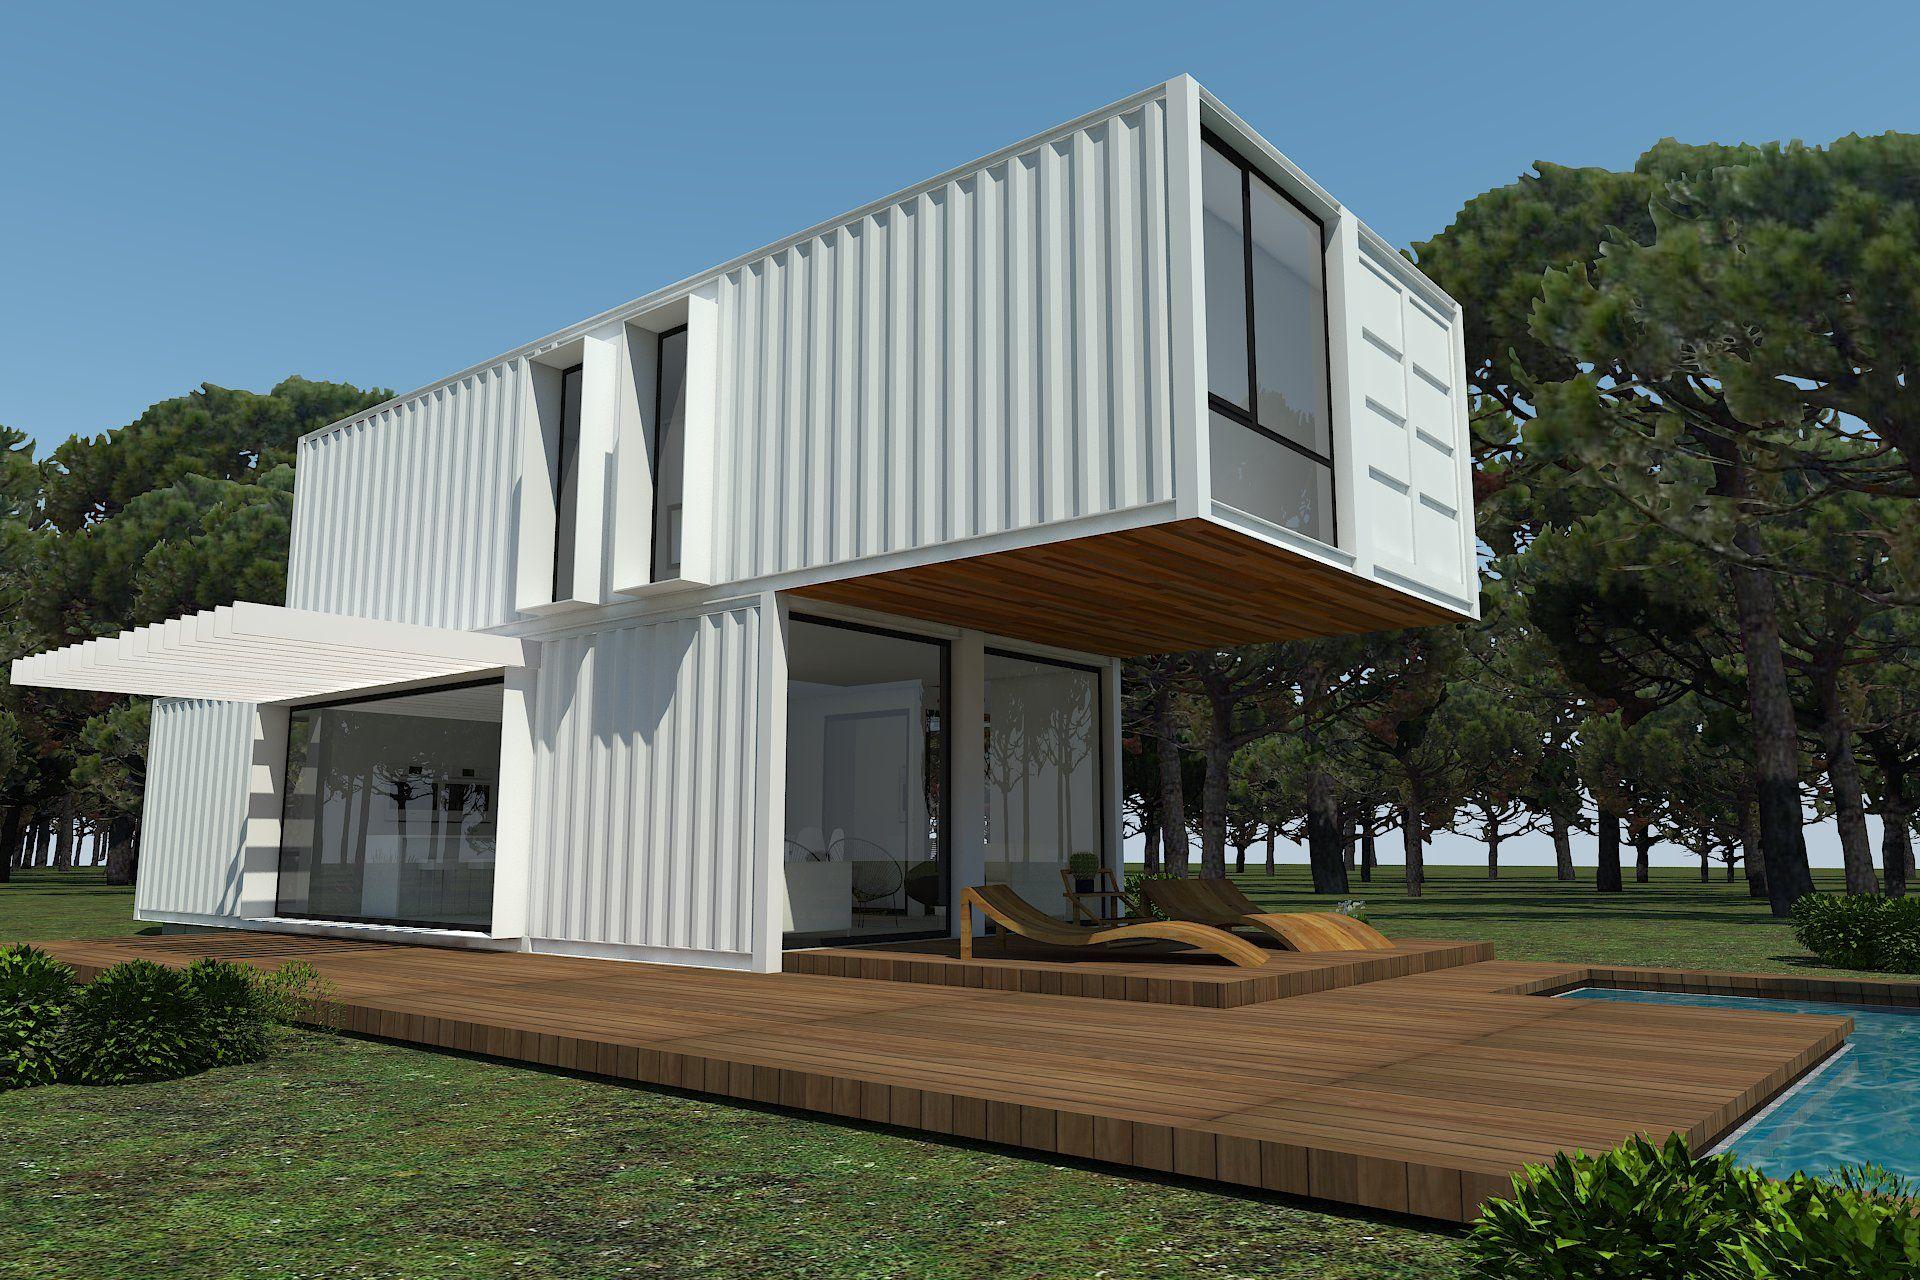 H kub casas prefabricadas en contenedores mar timos mi negocio pinterest contenedores - Casas hechas con contenedores maritimos ...